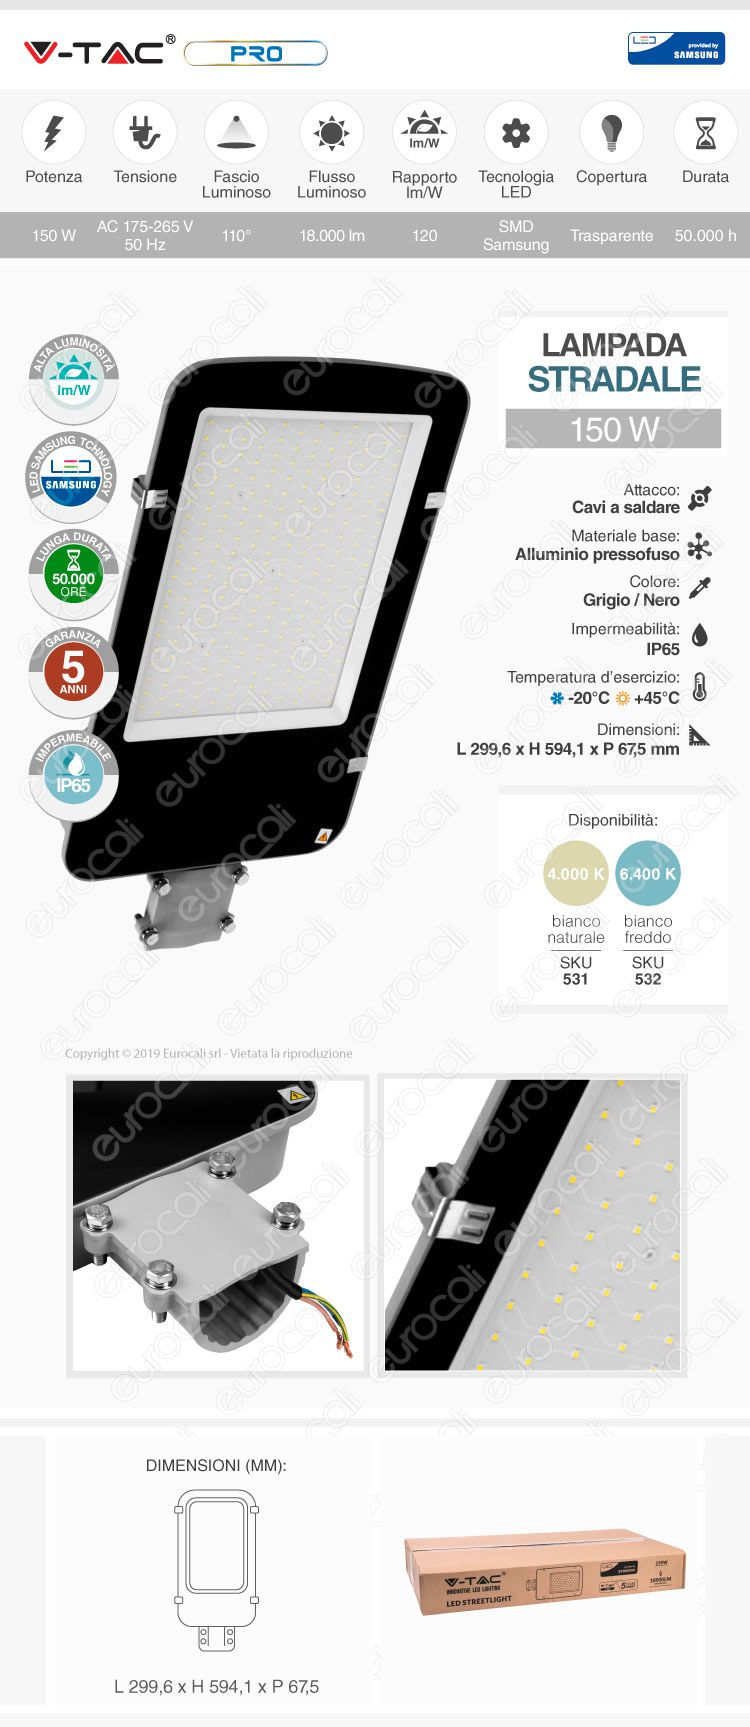 V-Tac PRO VT-150ST Lampada Stradale LED 150W Lampione SMD Chip Samsung